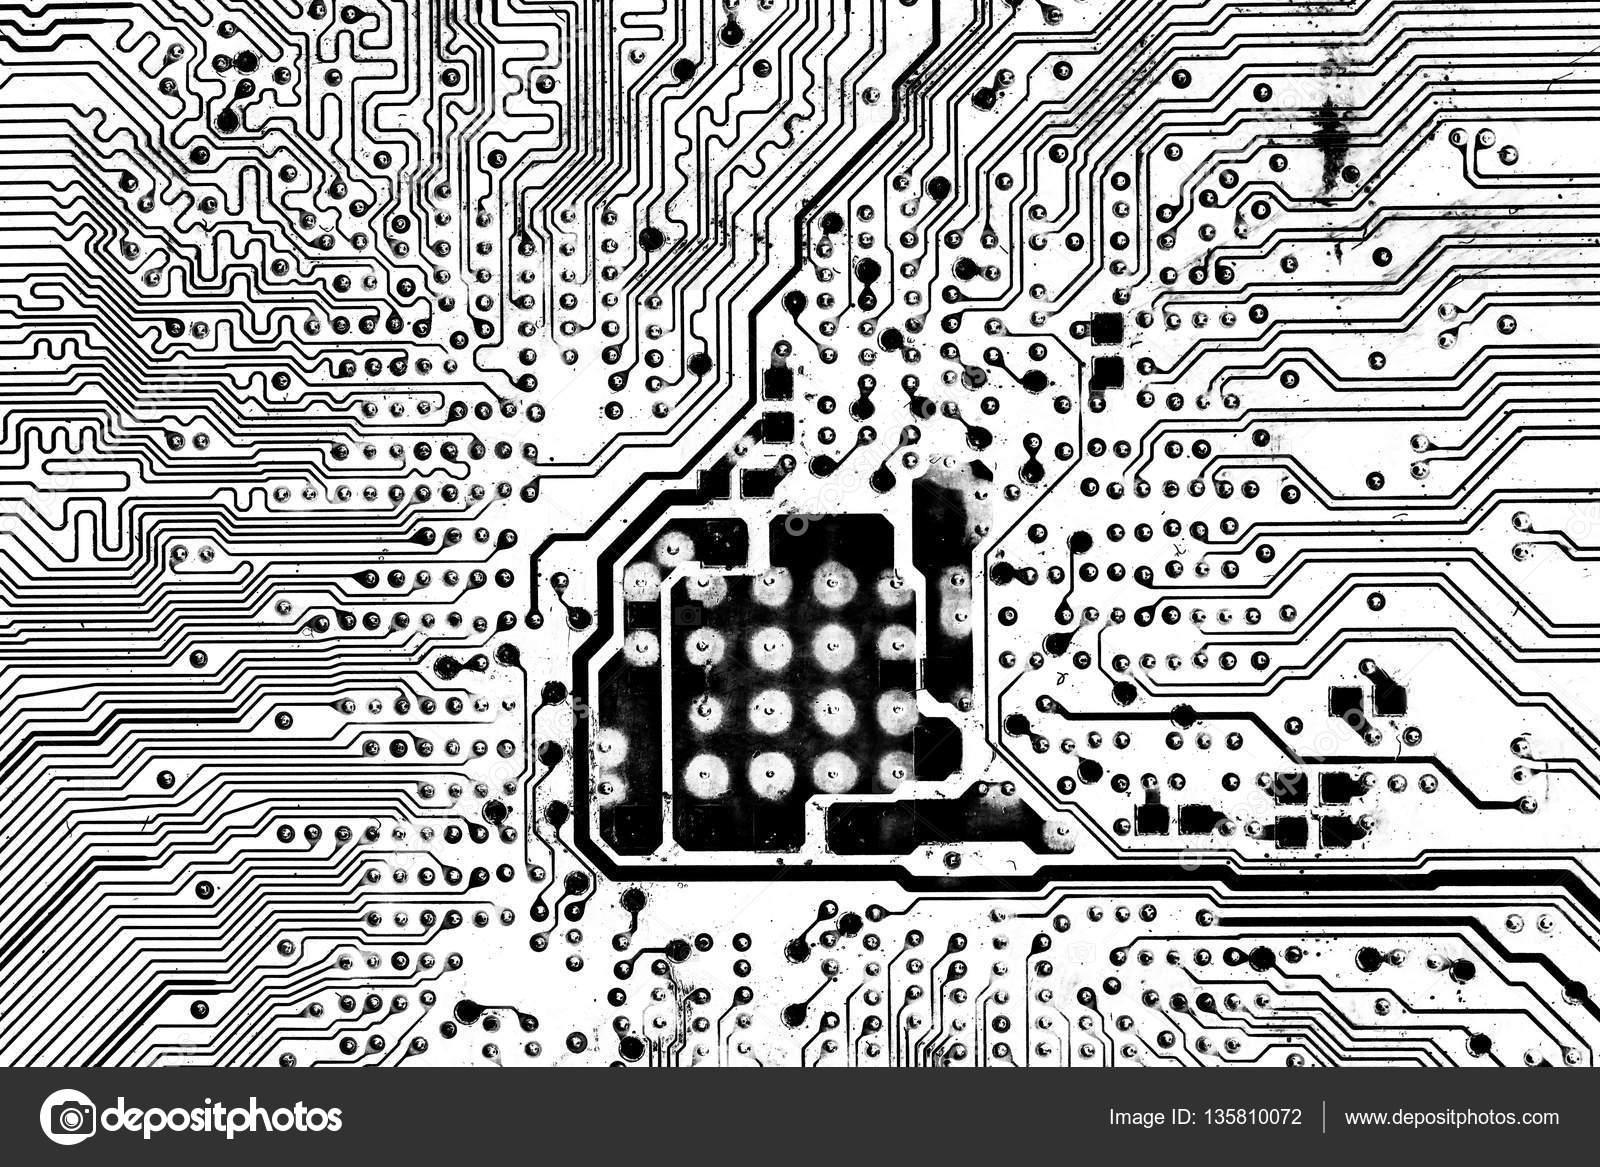 Circuito Eletrico : Circuito elétrico preto e branco para o fundo u stock photo